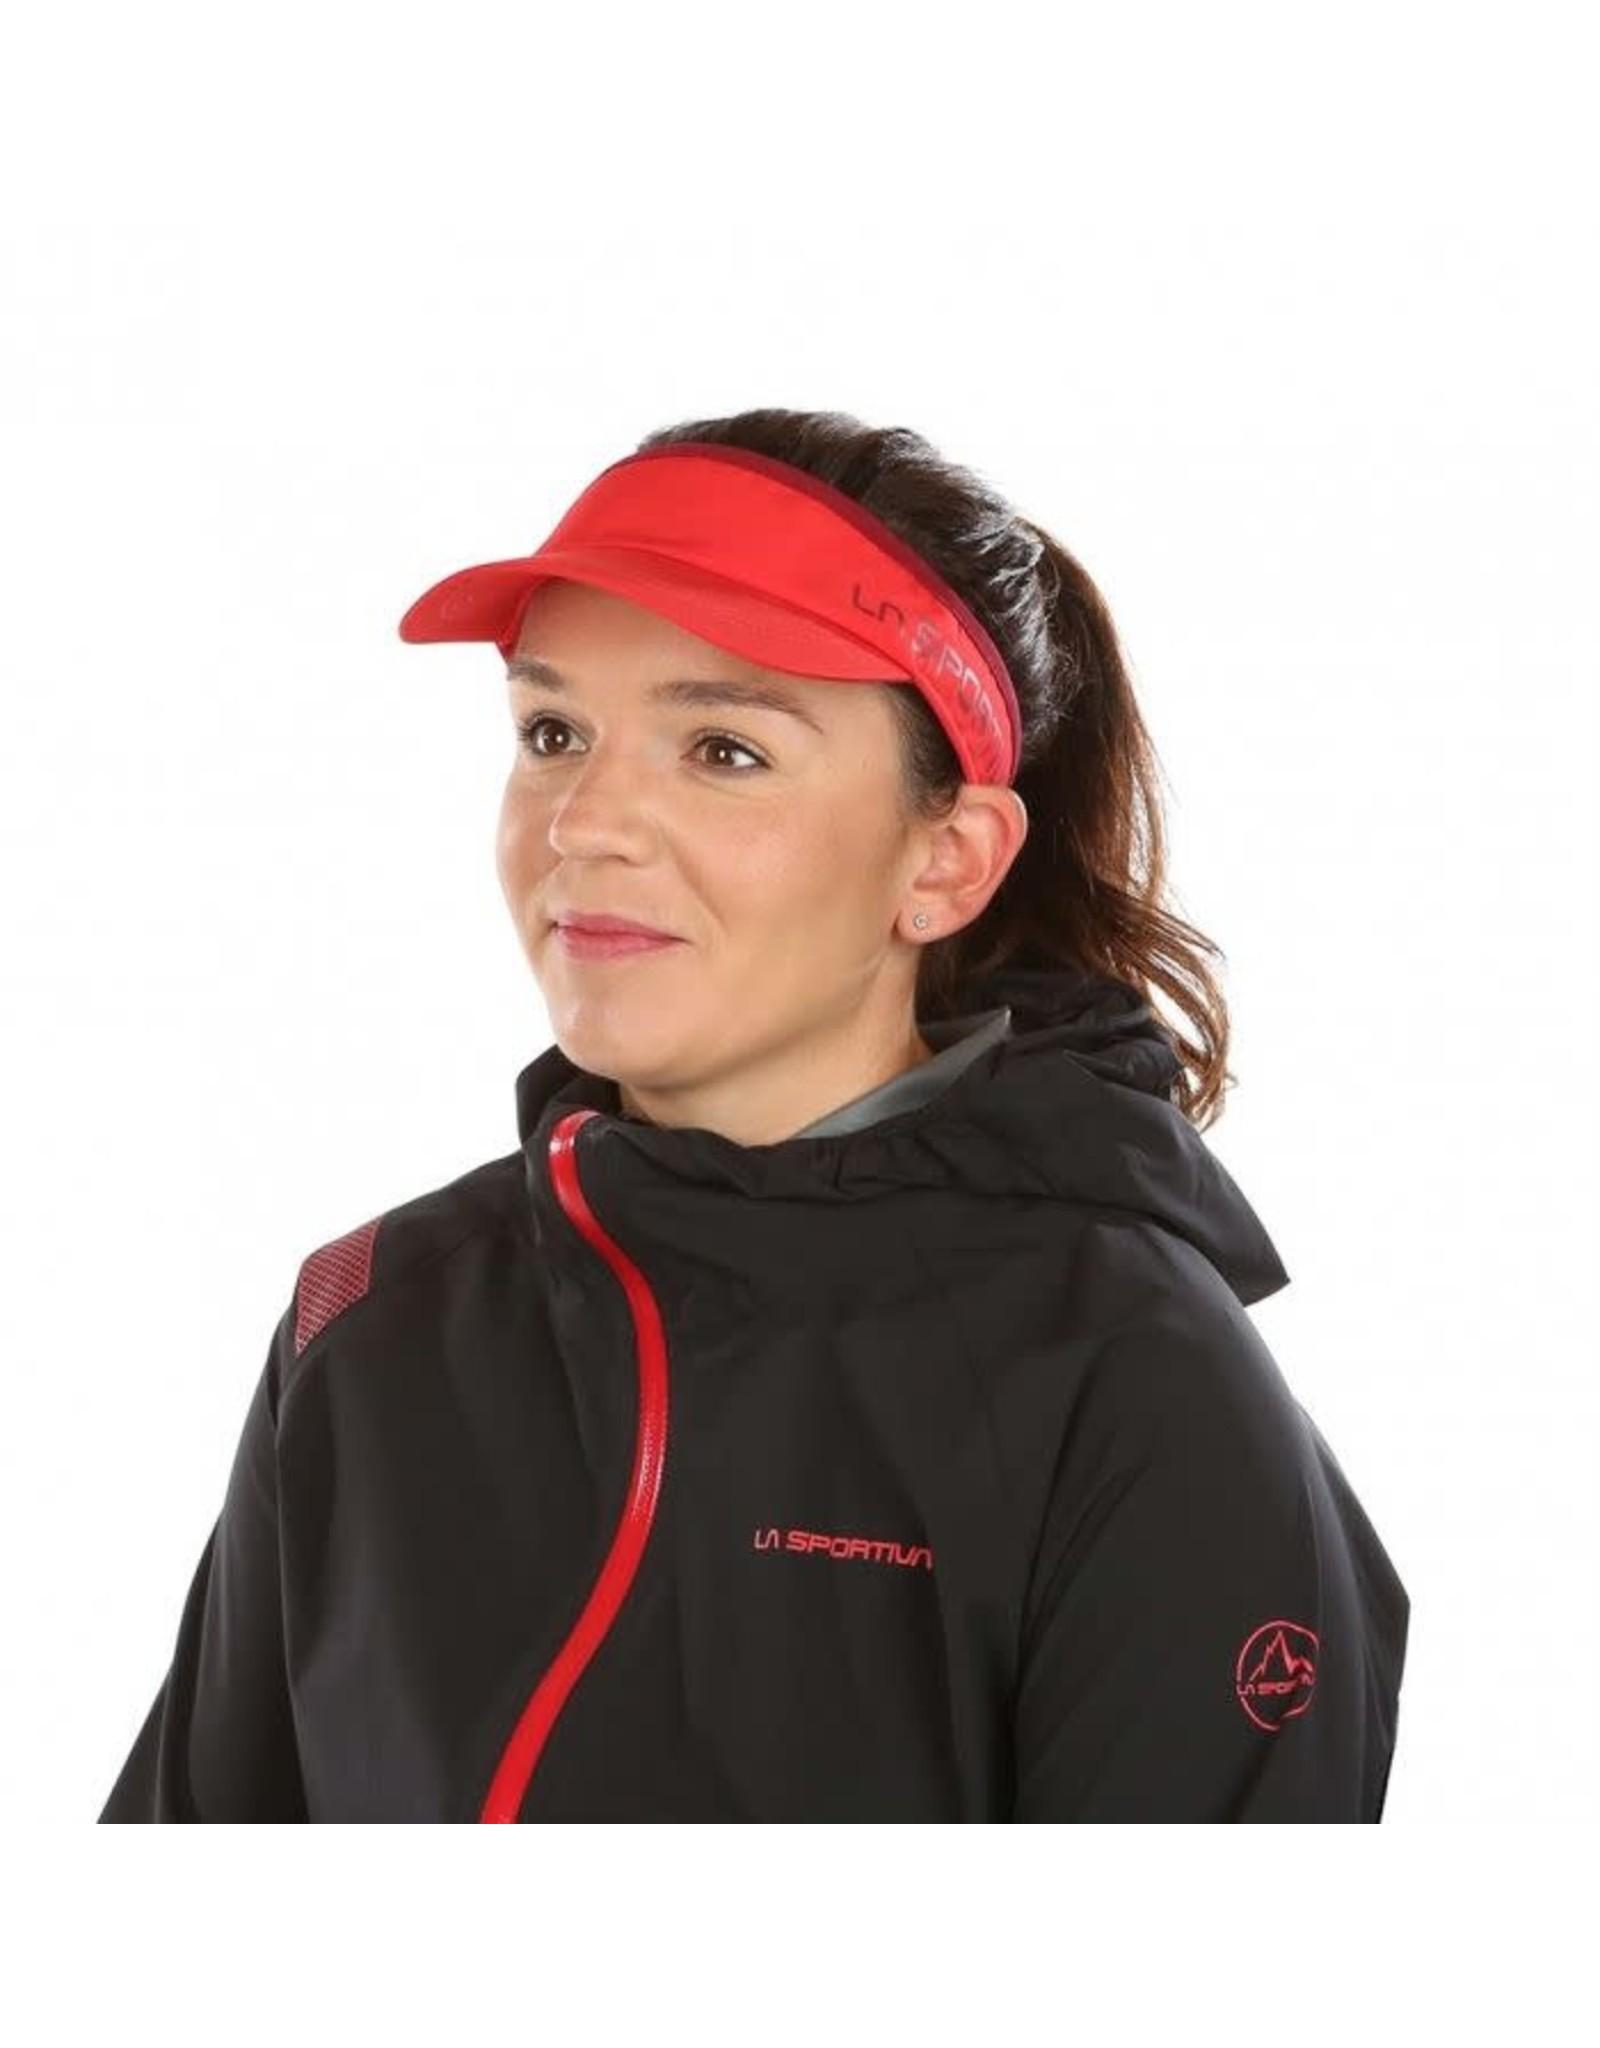 La Sportiva La Sportiva Advisor Hat - Unisex